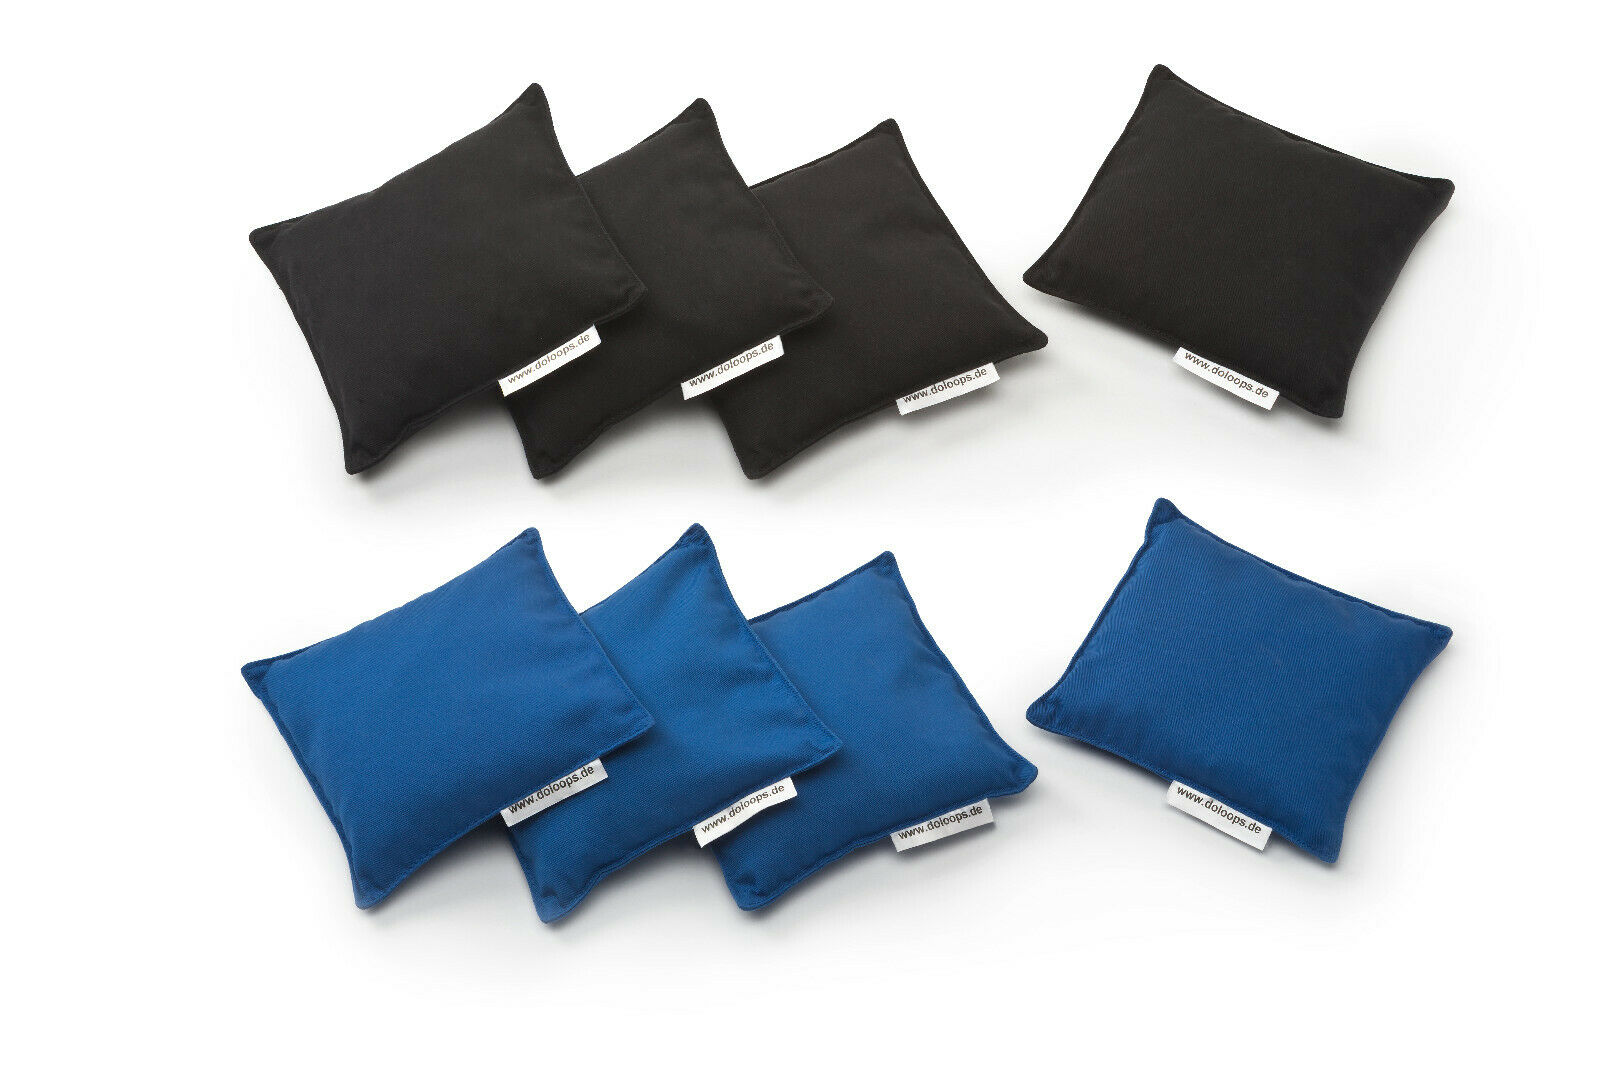 Original Cornhole Bags im Set -  8er Cornhole Bag Set 4 blaue & 4 schwarze Bags